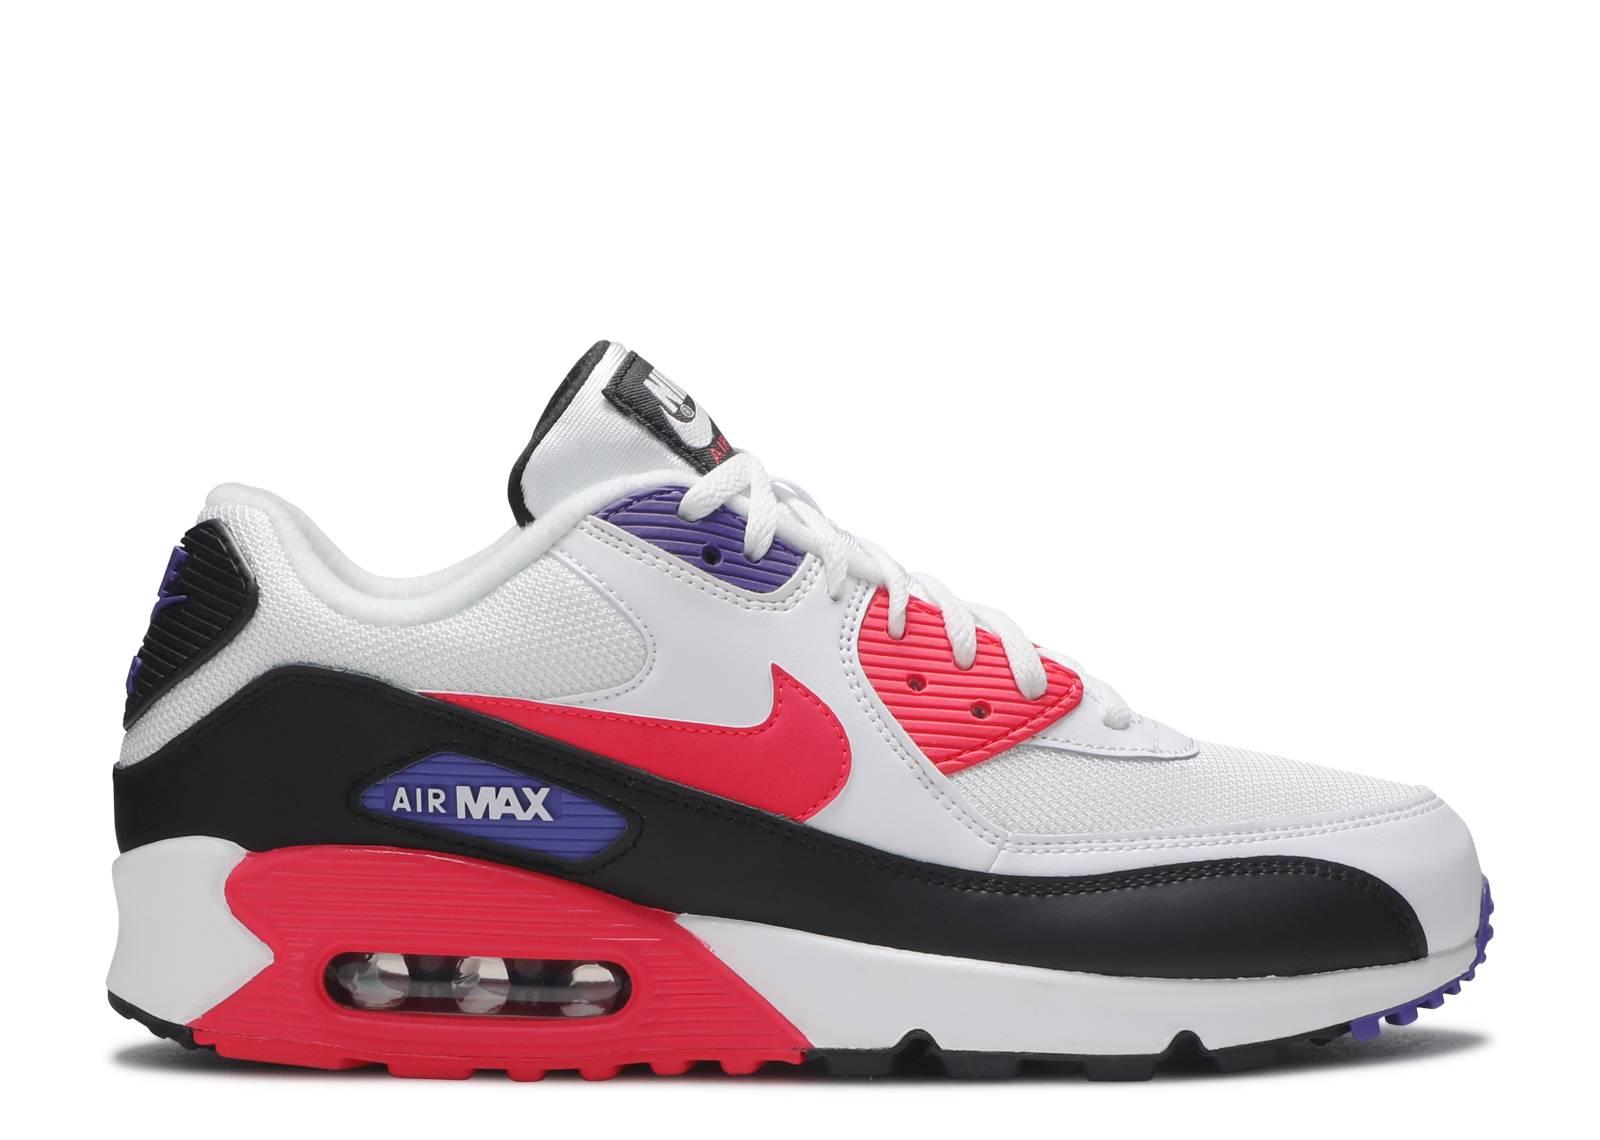 Nike Free Sport Schuhe Nike Air Max 90 Ultra 2.0 SE Männer